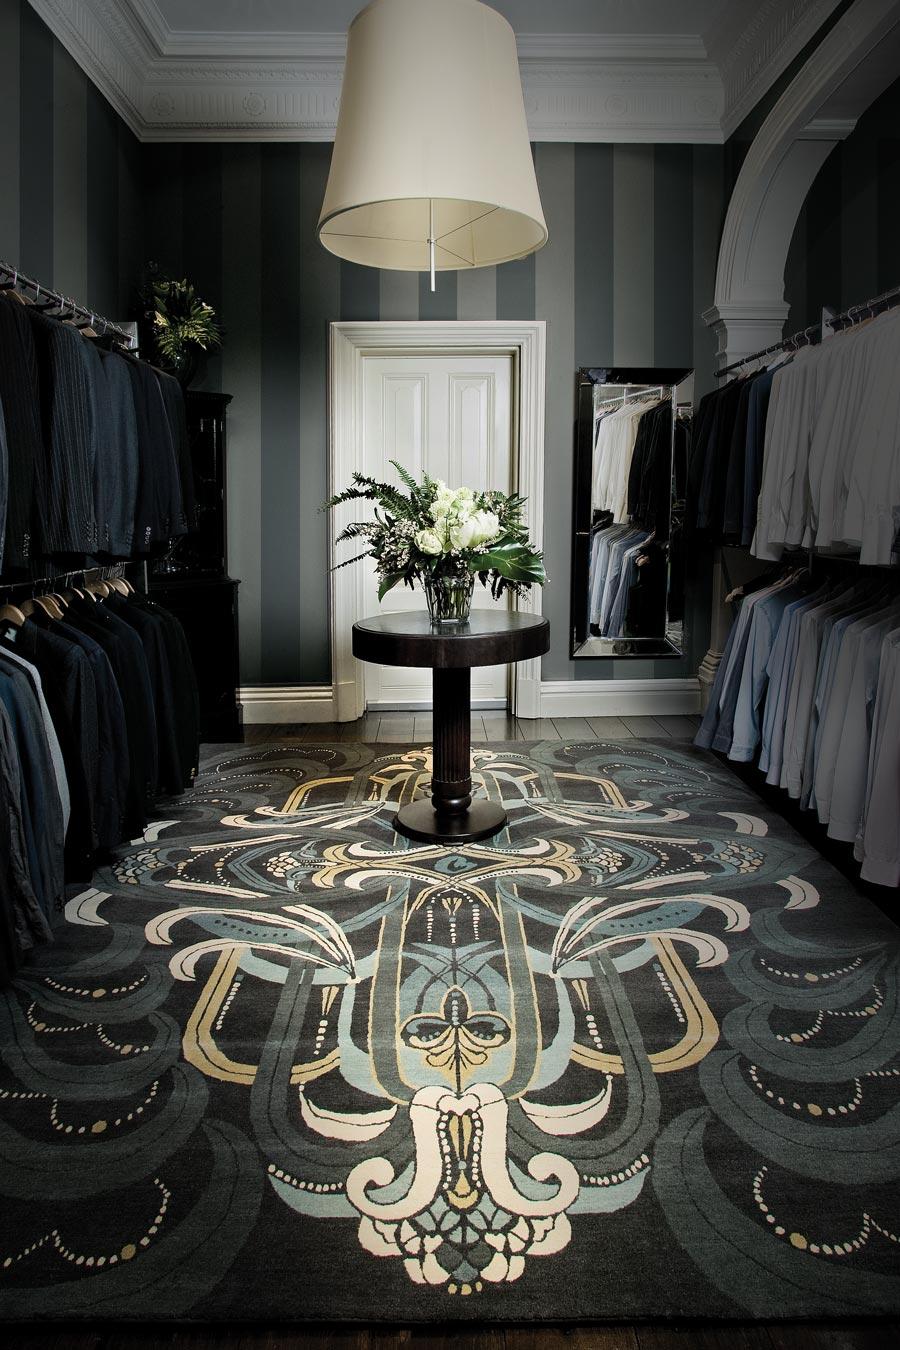 location wardrobe shot of rhapsody rug by catherine martin